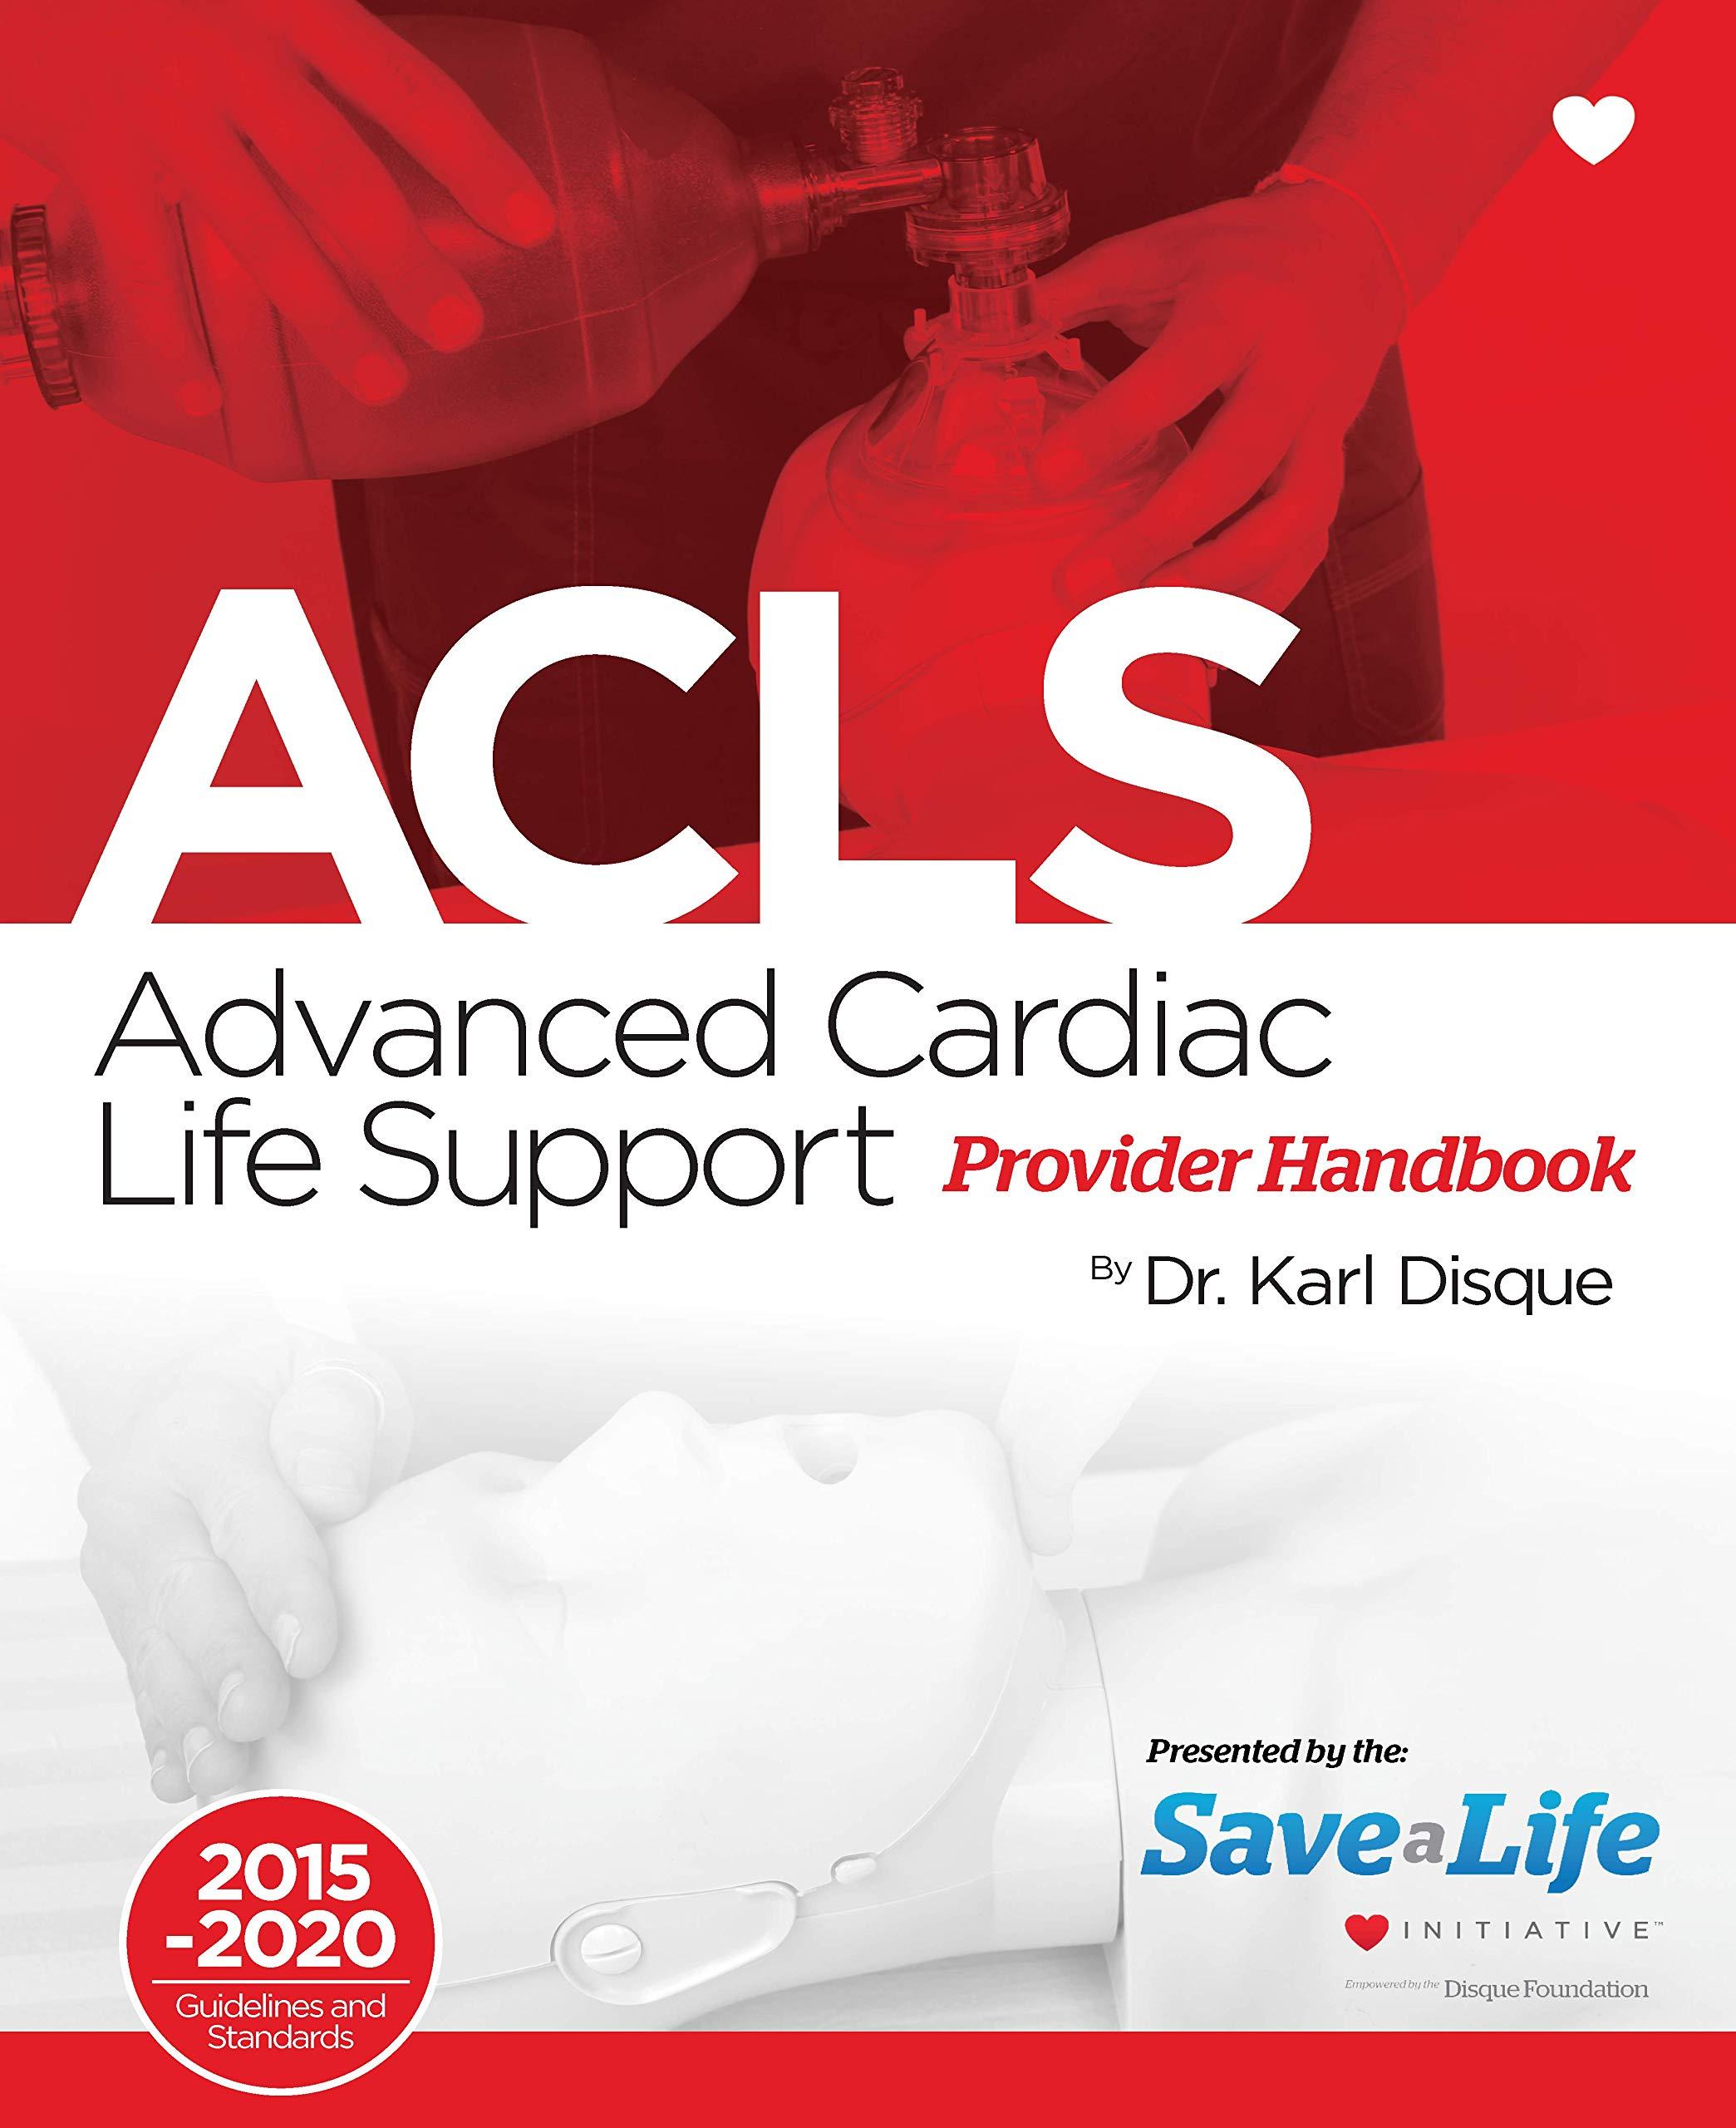 Acls Provider Manual Pdf 2020